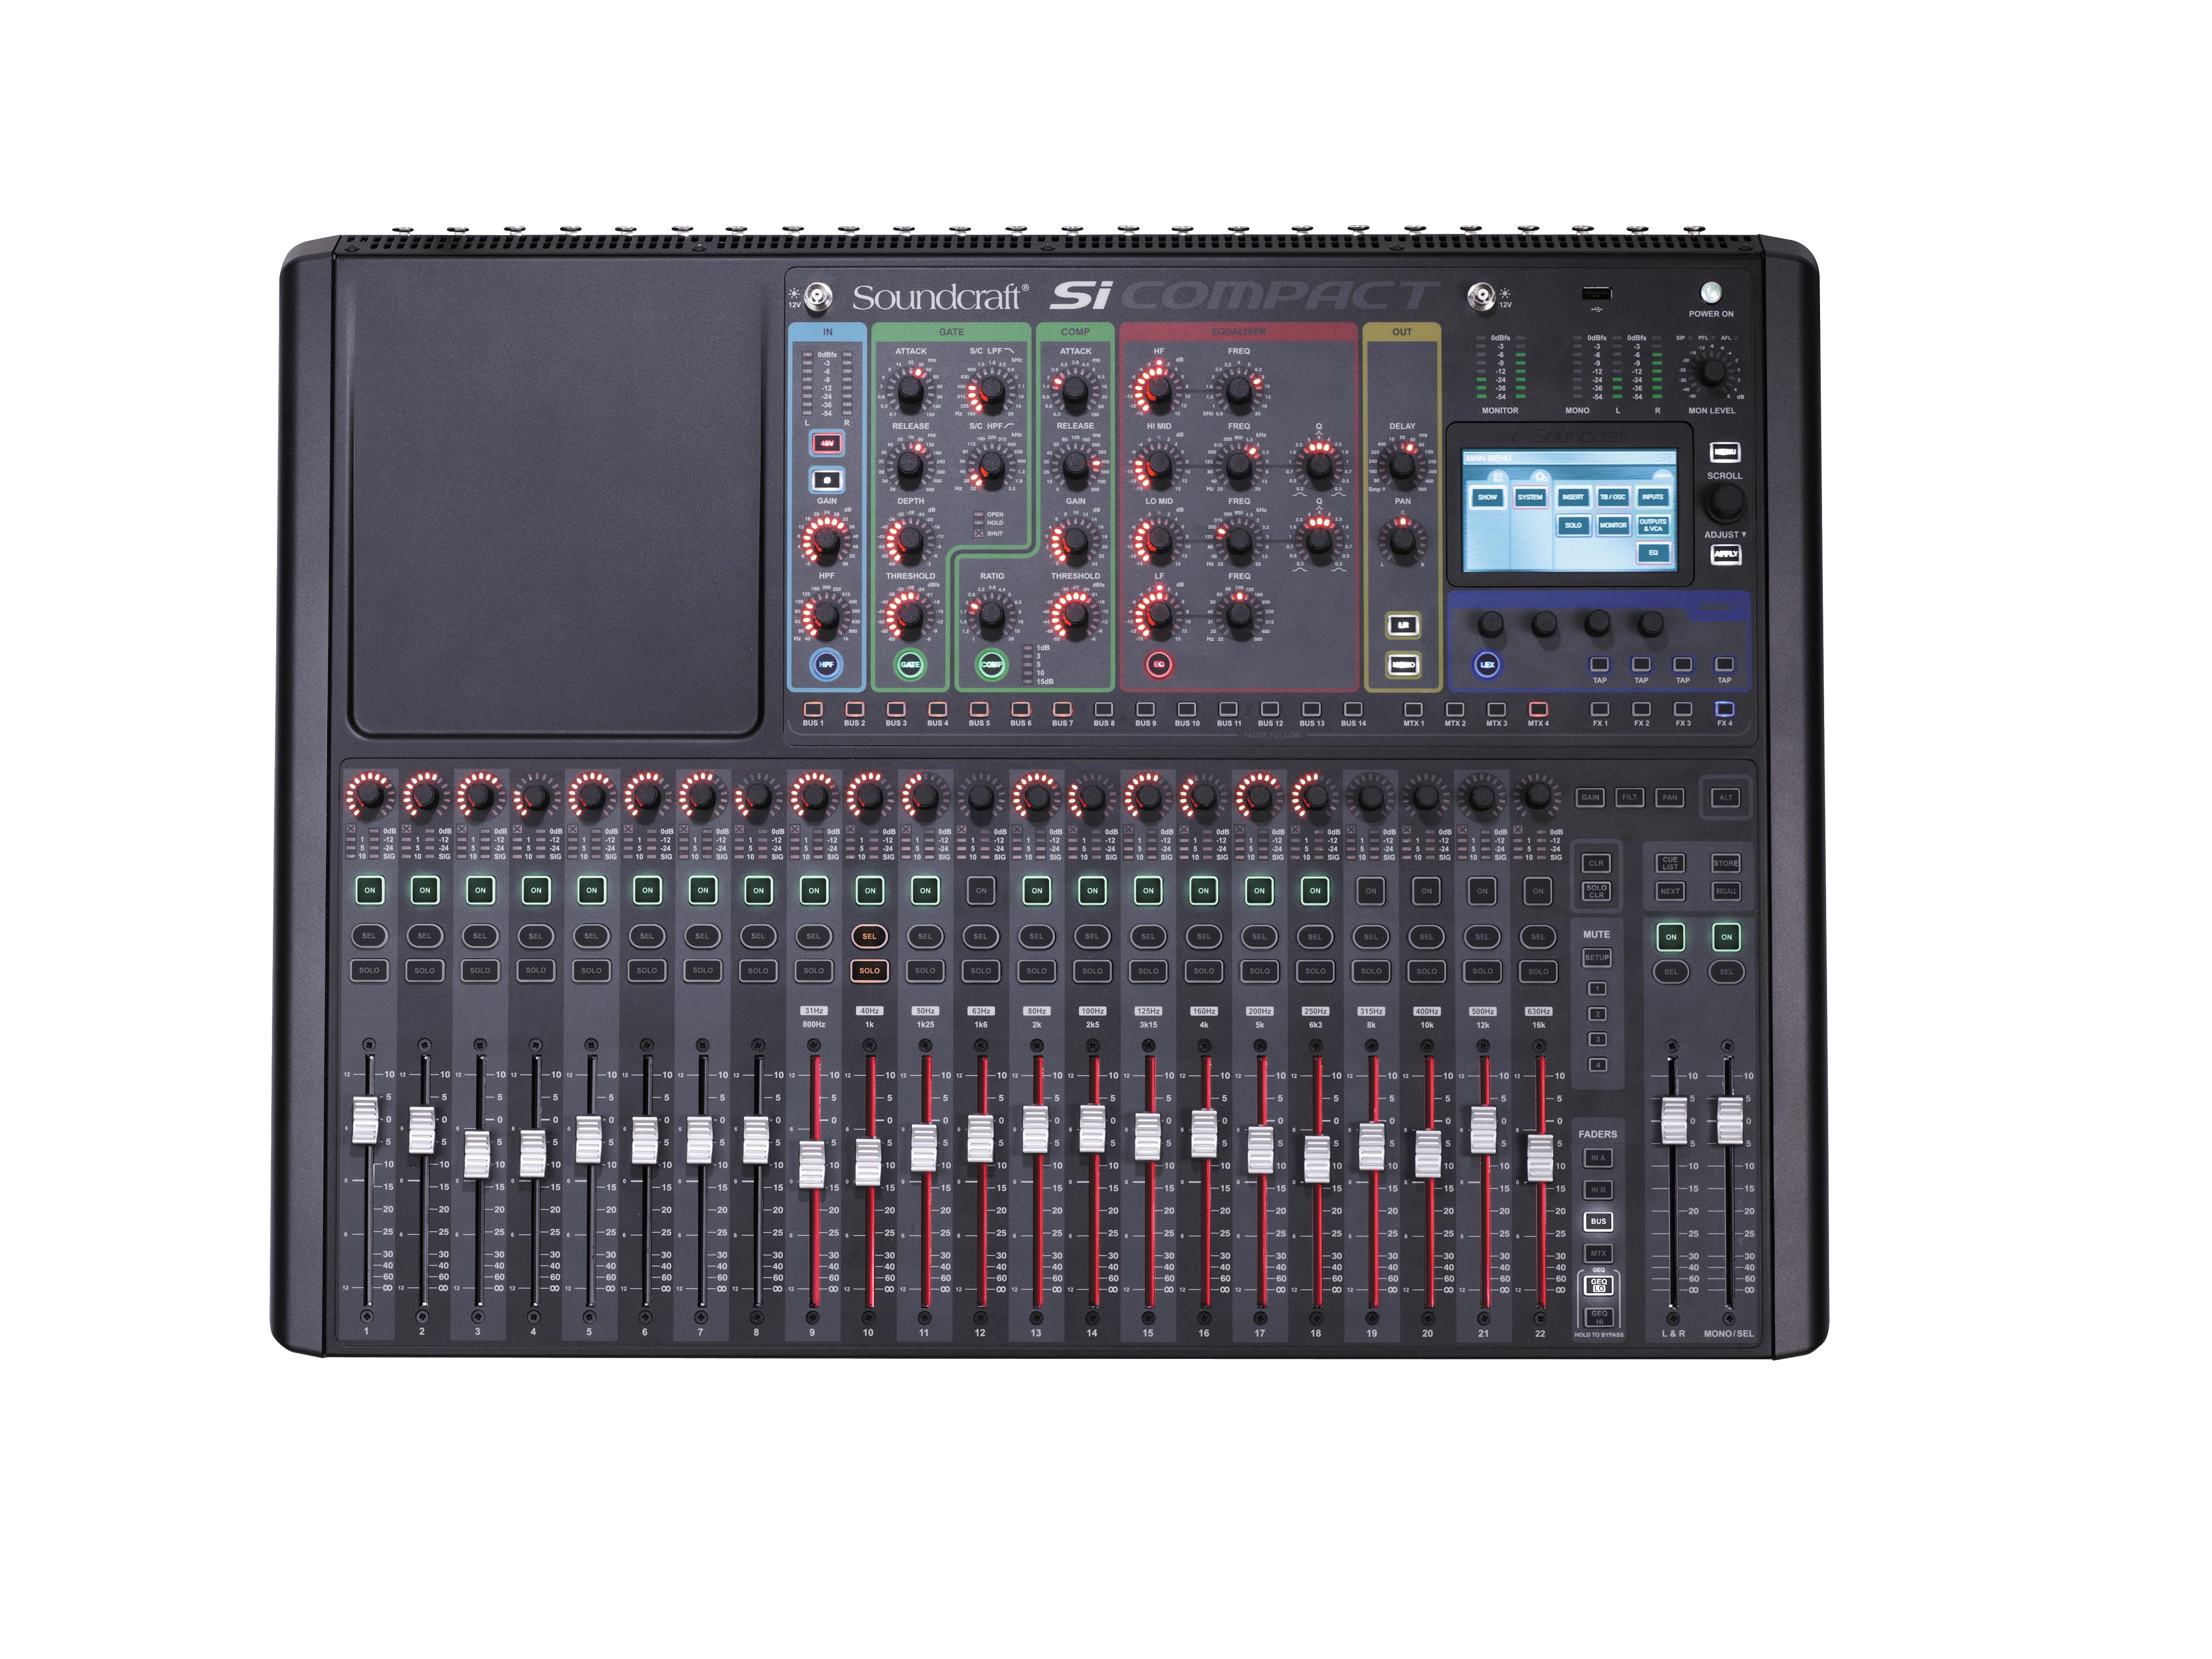 Si Compact 24 | Soundcraft - Professional Audio Mixers